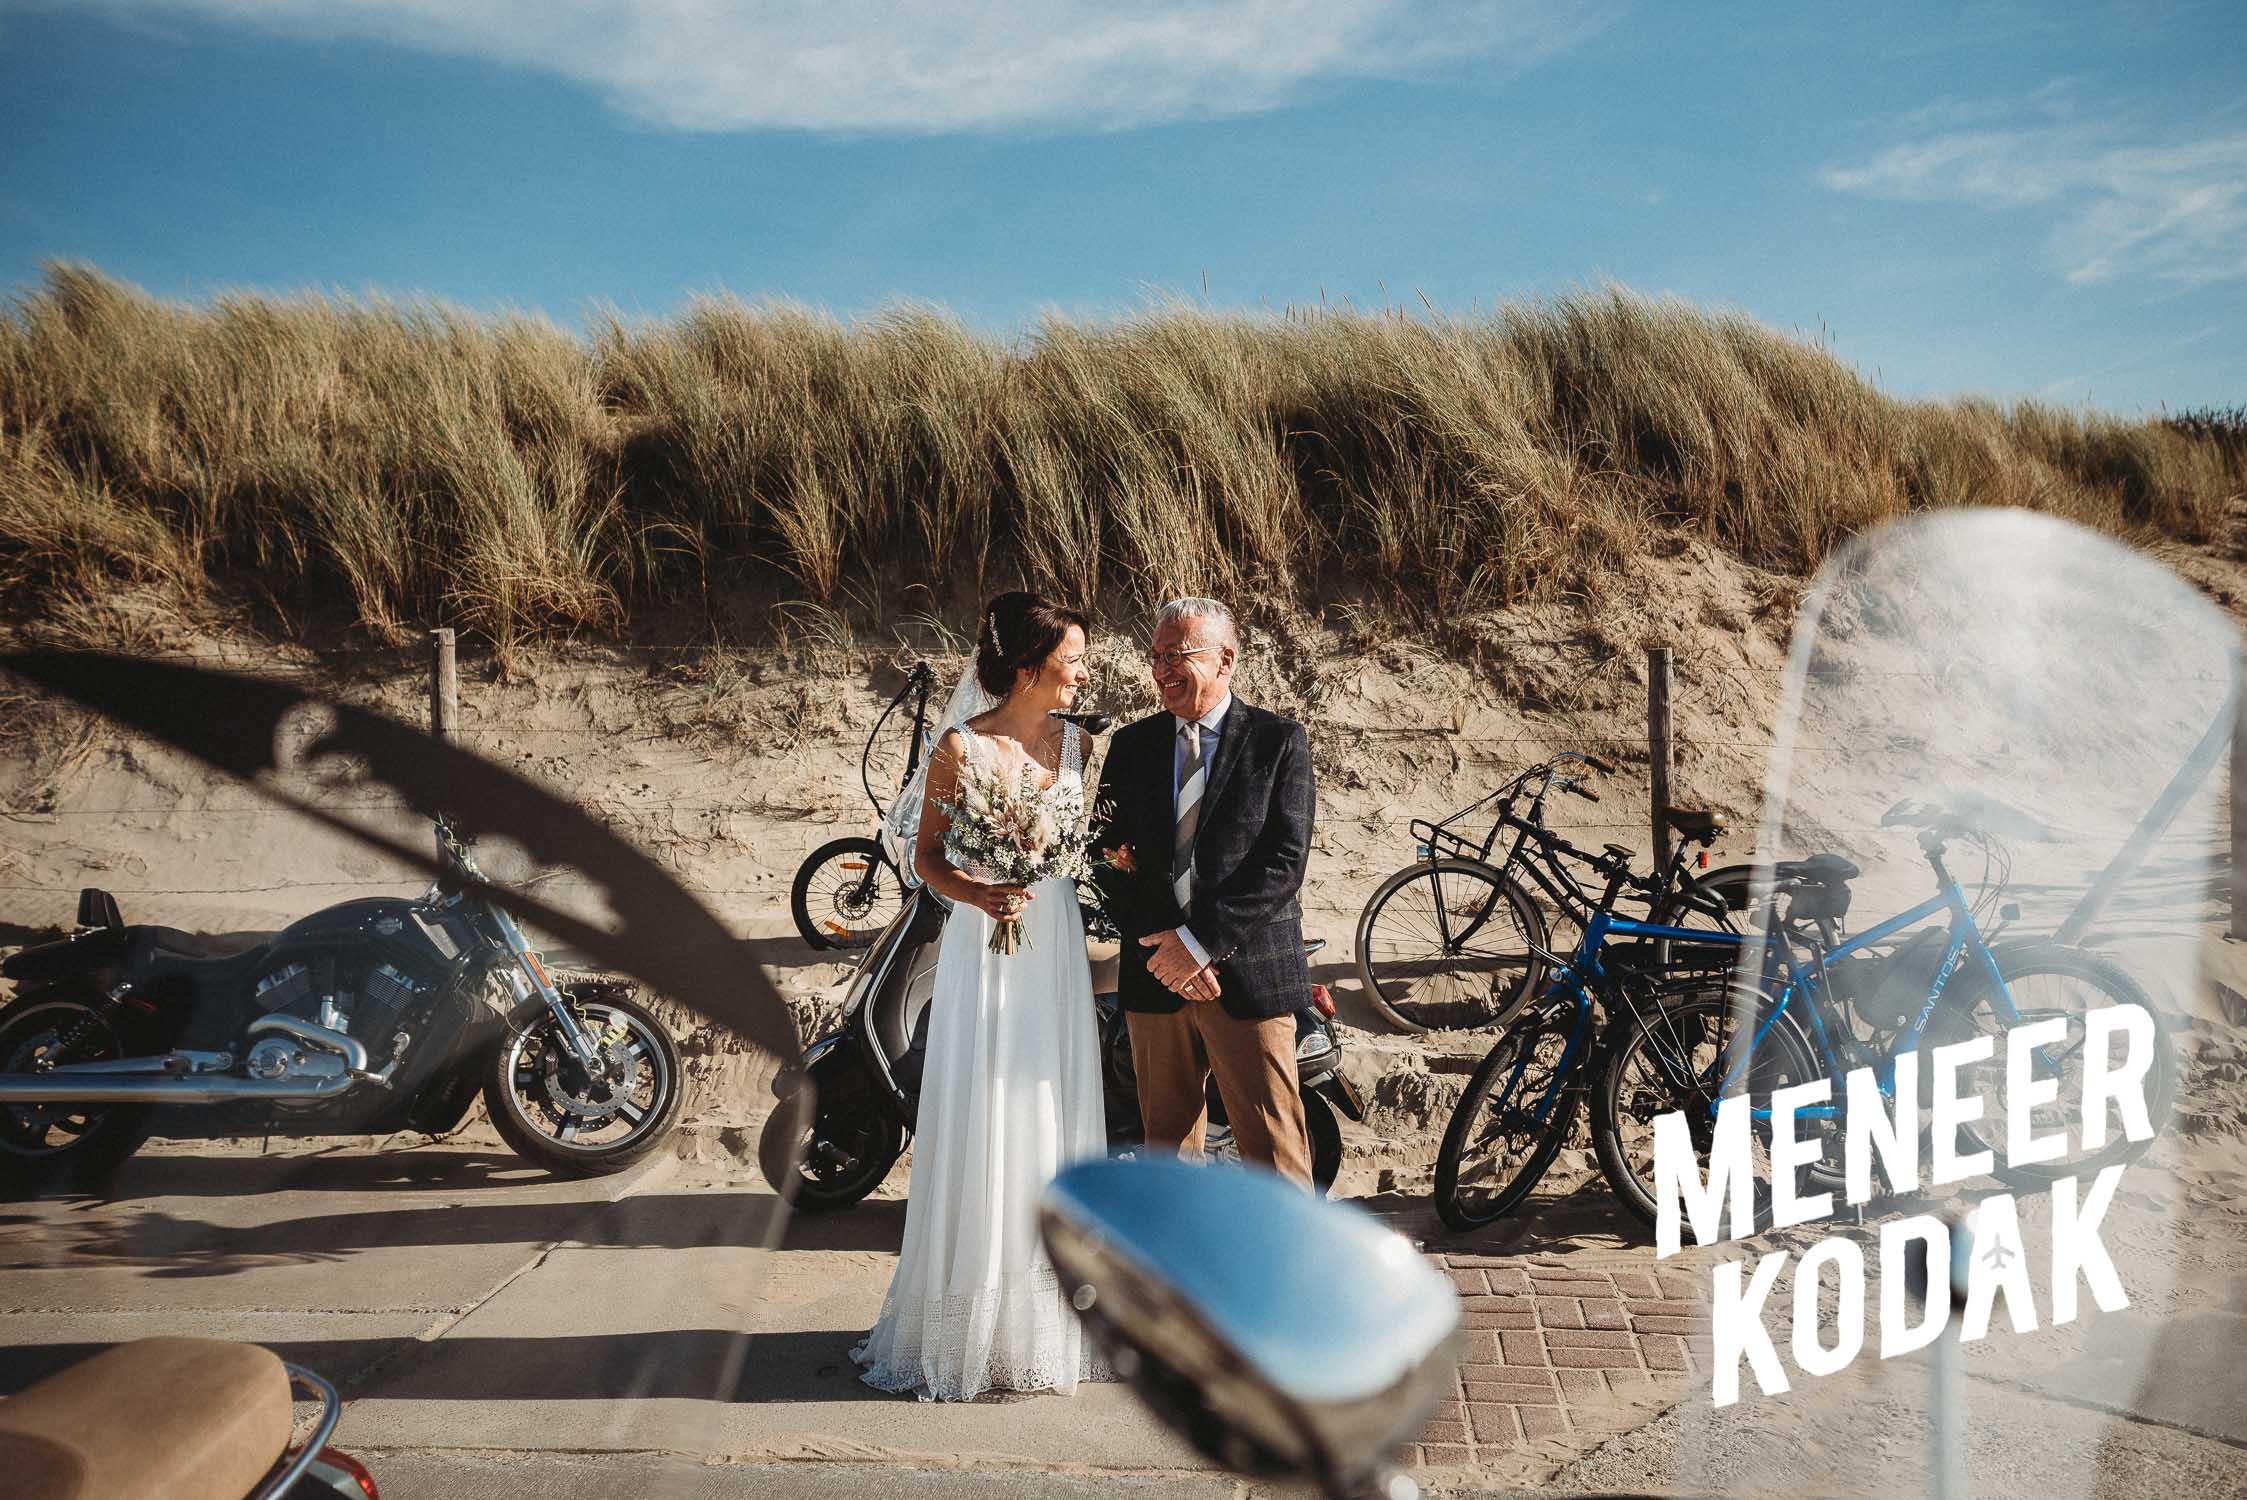 Meneer Kodak - Strandbruiloft - Noordwijk - K&A-077.jpg